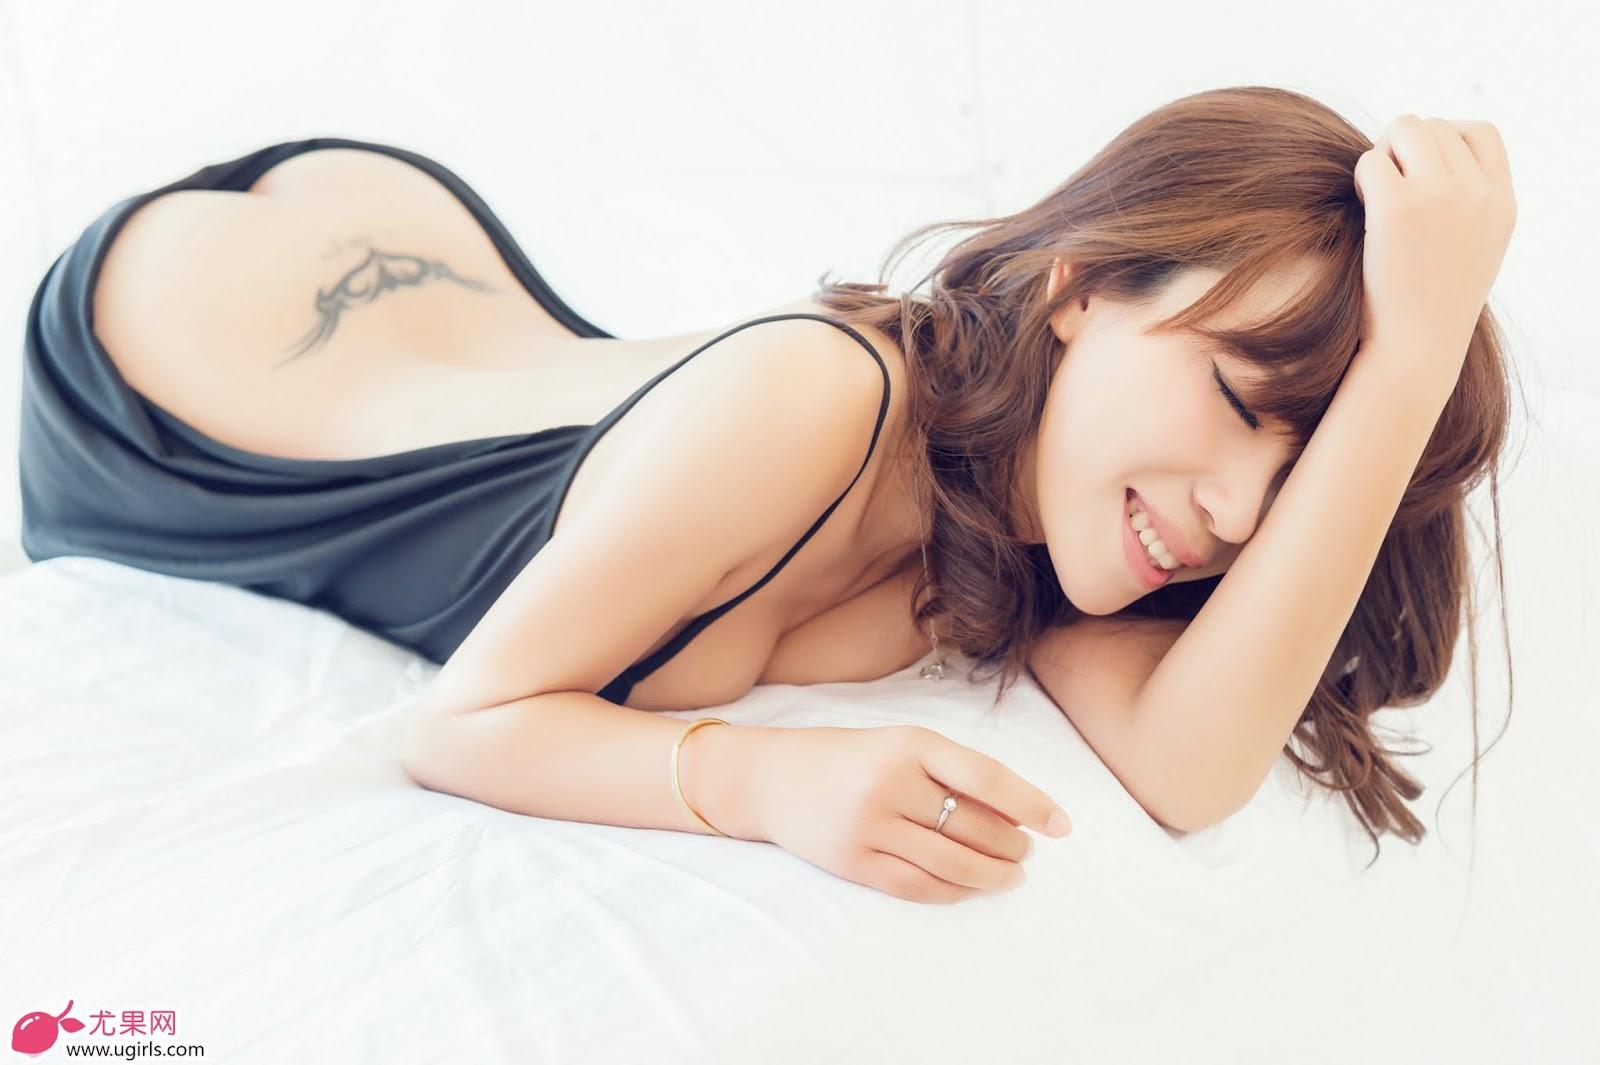 DLS 019211 - Hot Girl Ugirls No.021 Model: 田依依